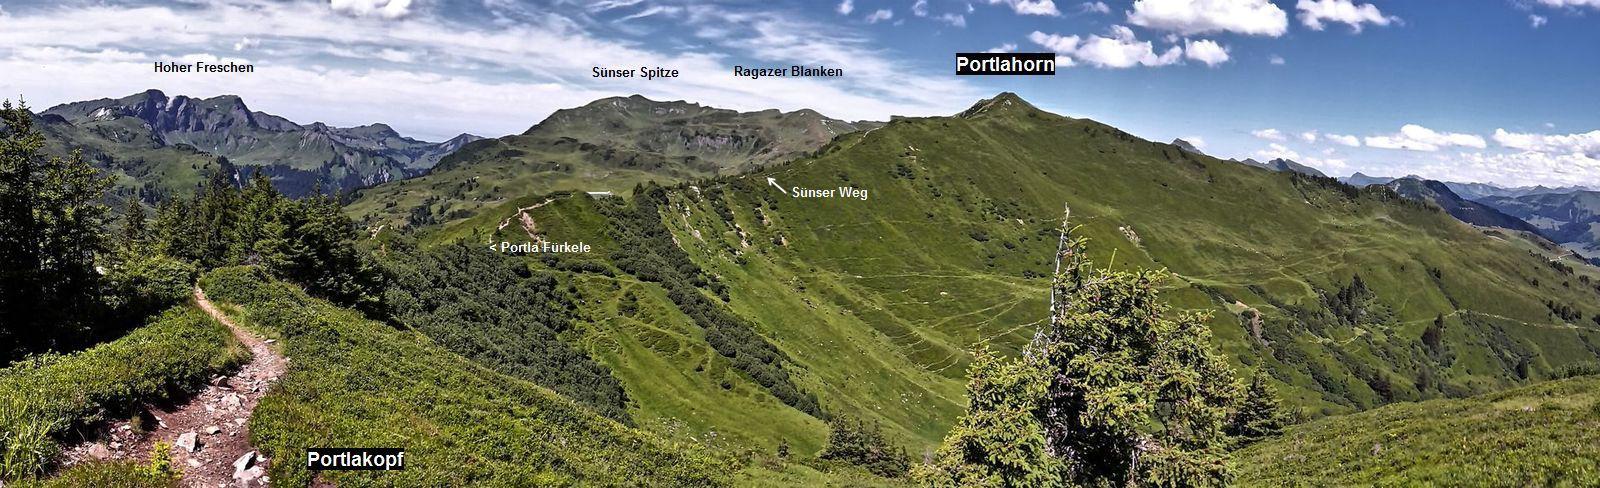 Sünser Weg und Portlahorn (2010 m)  vom Portlakopf (1905 m)